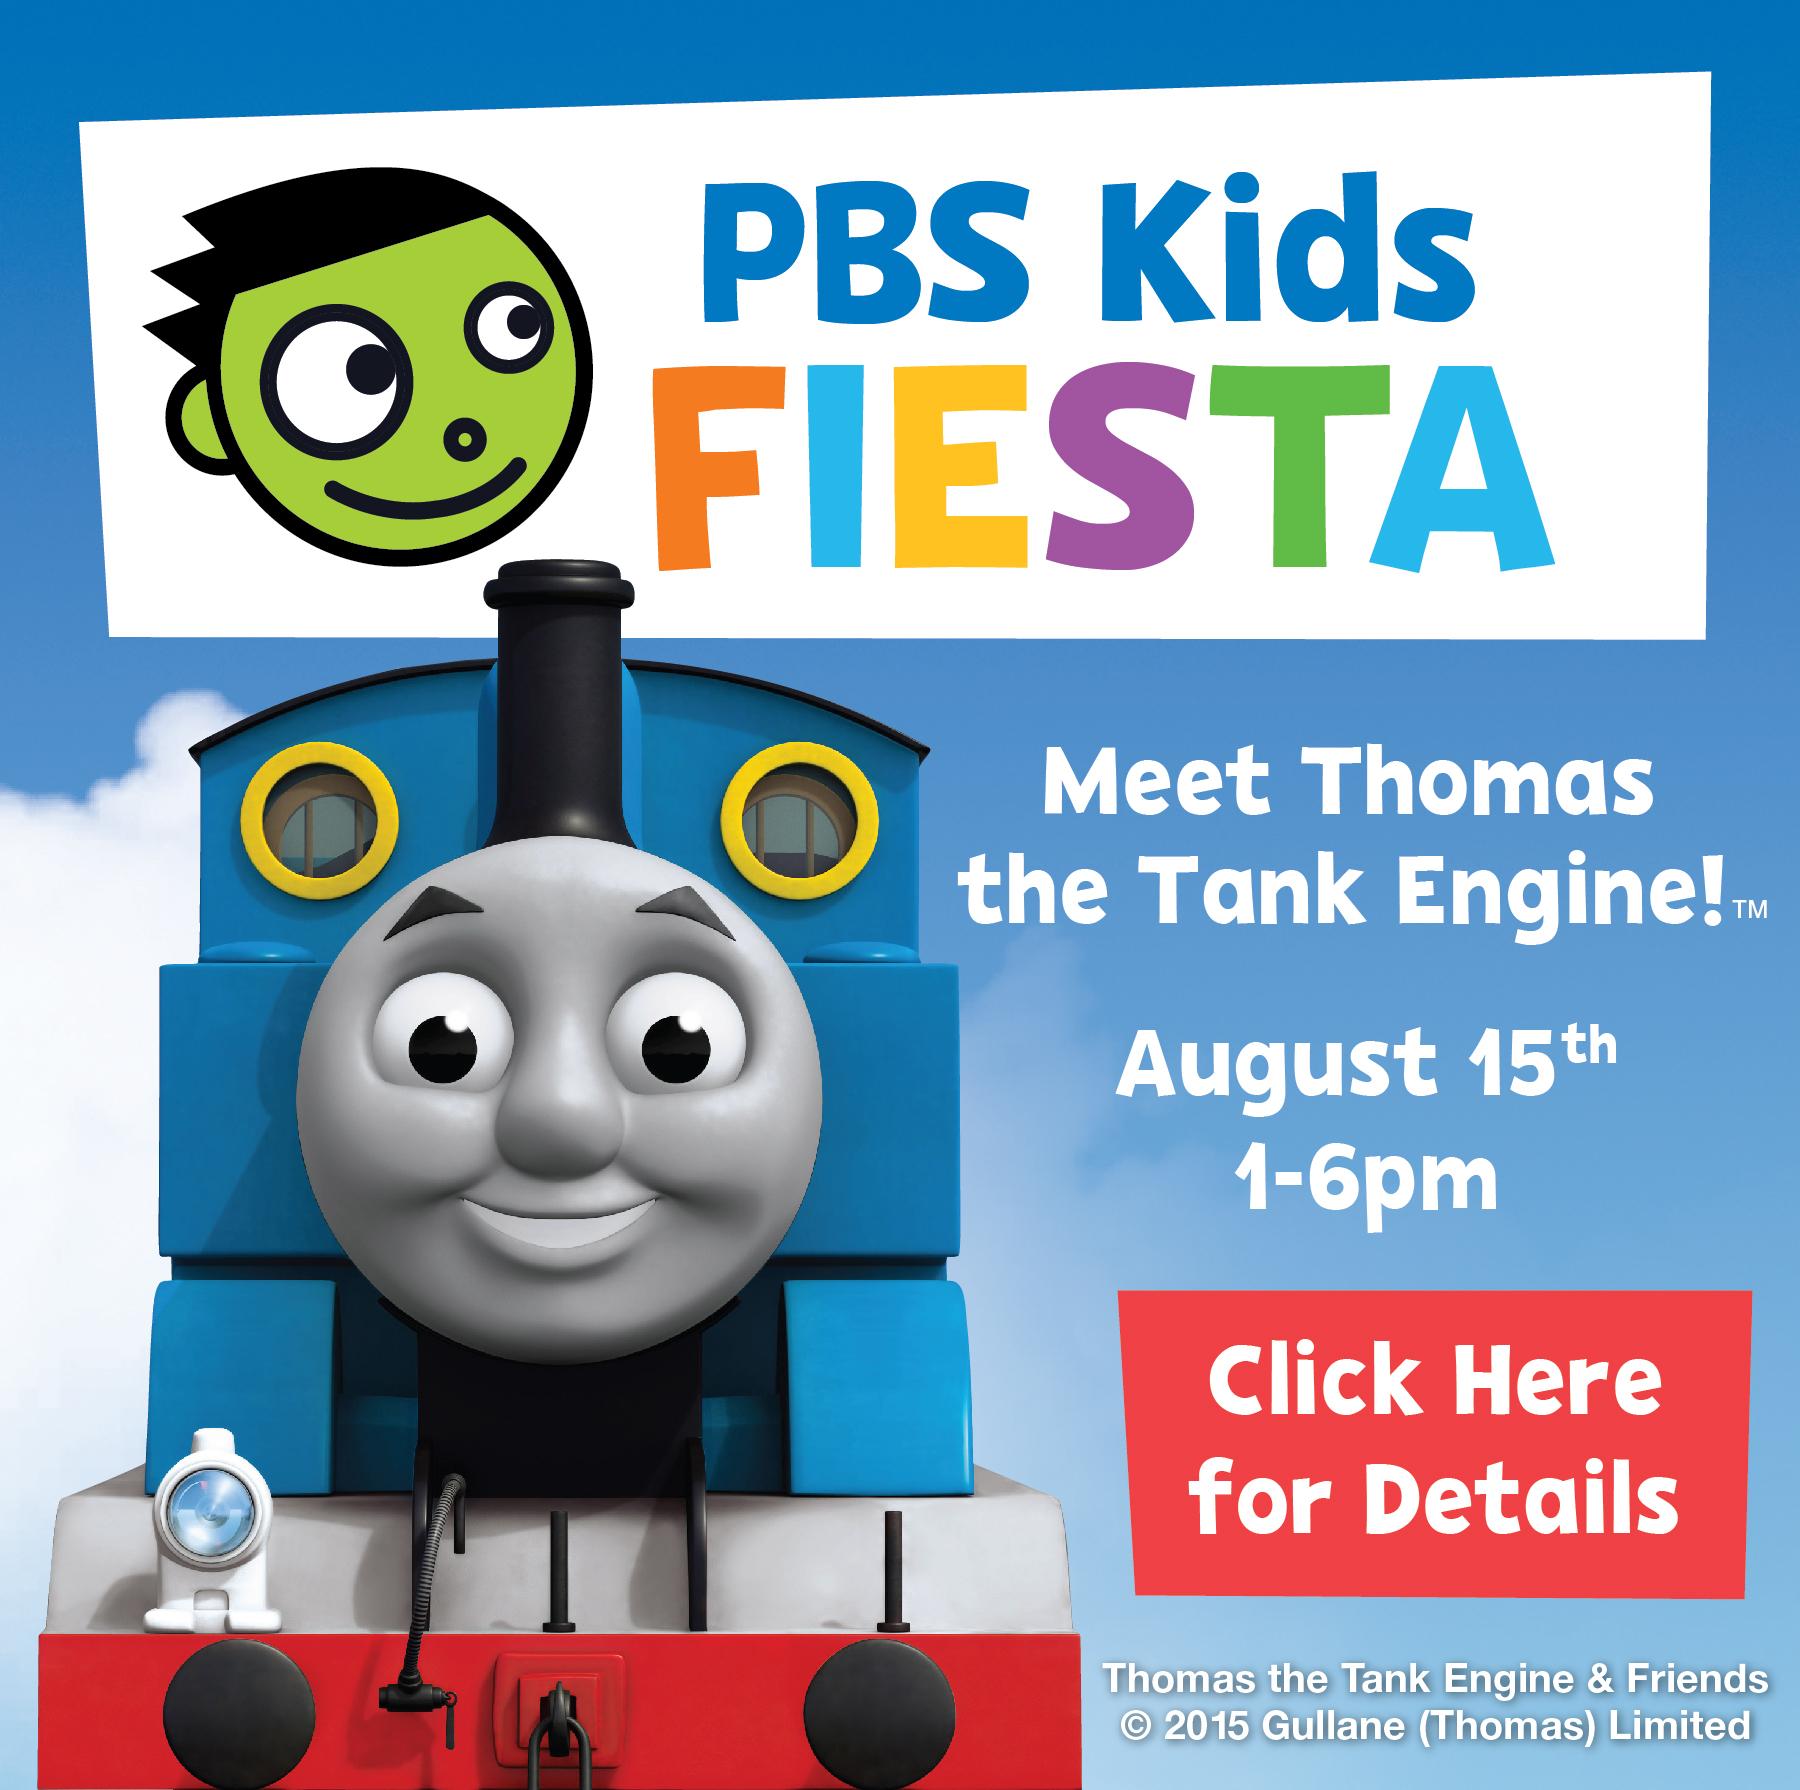 PBS Kids Fiesta Ad Sky 2-01.jpg